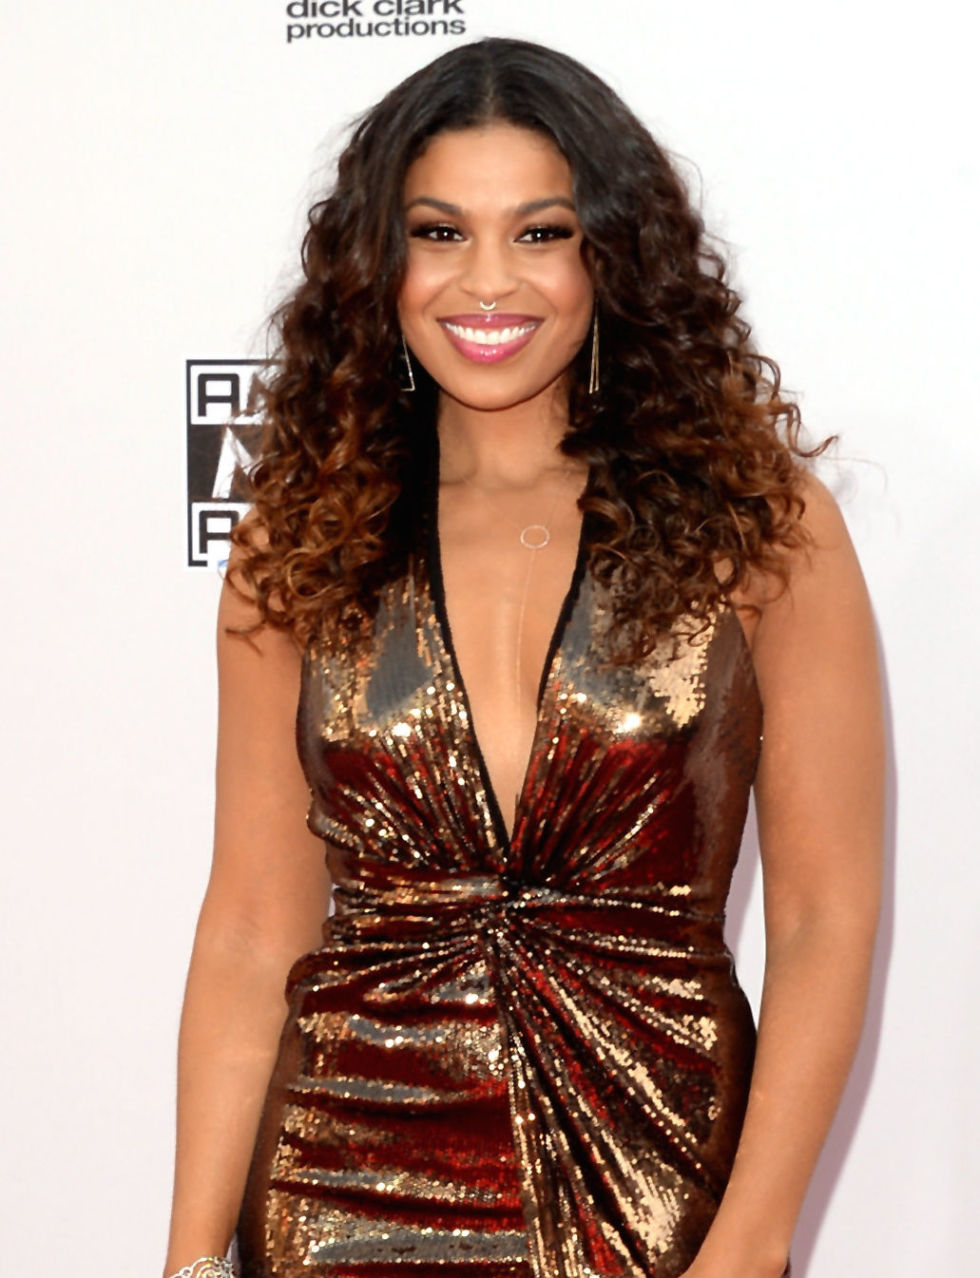 Peachy 30 Best Curly Hairstyles Of 2017 Cute Hairstyles For Curly Hair Short Hairstyles For Black Women Fulllsitofus